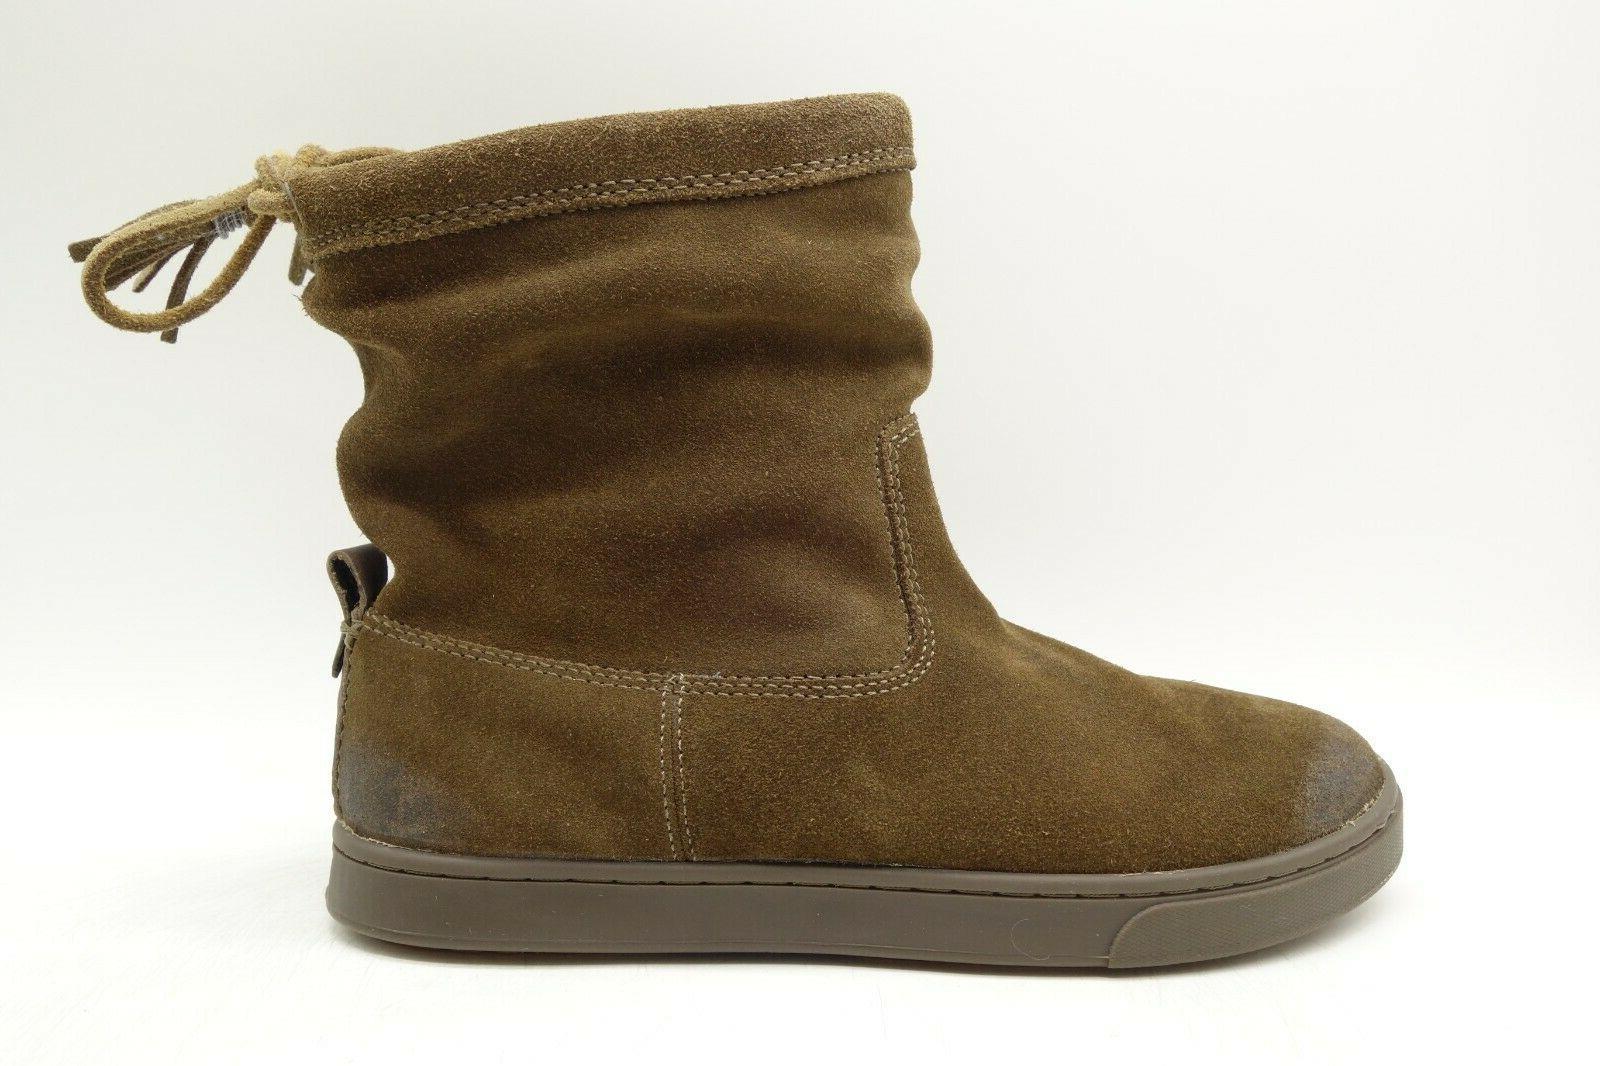 Olukai Kapa Moe On Ankle Boots Women's 8